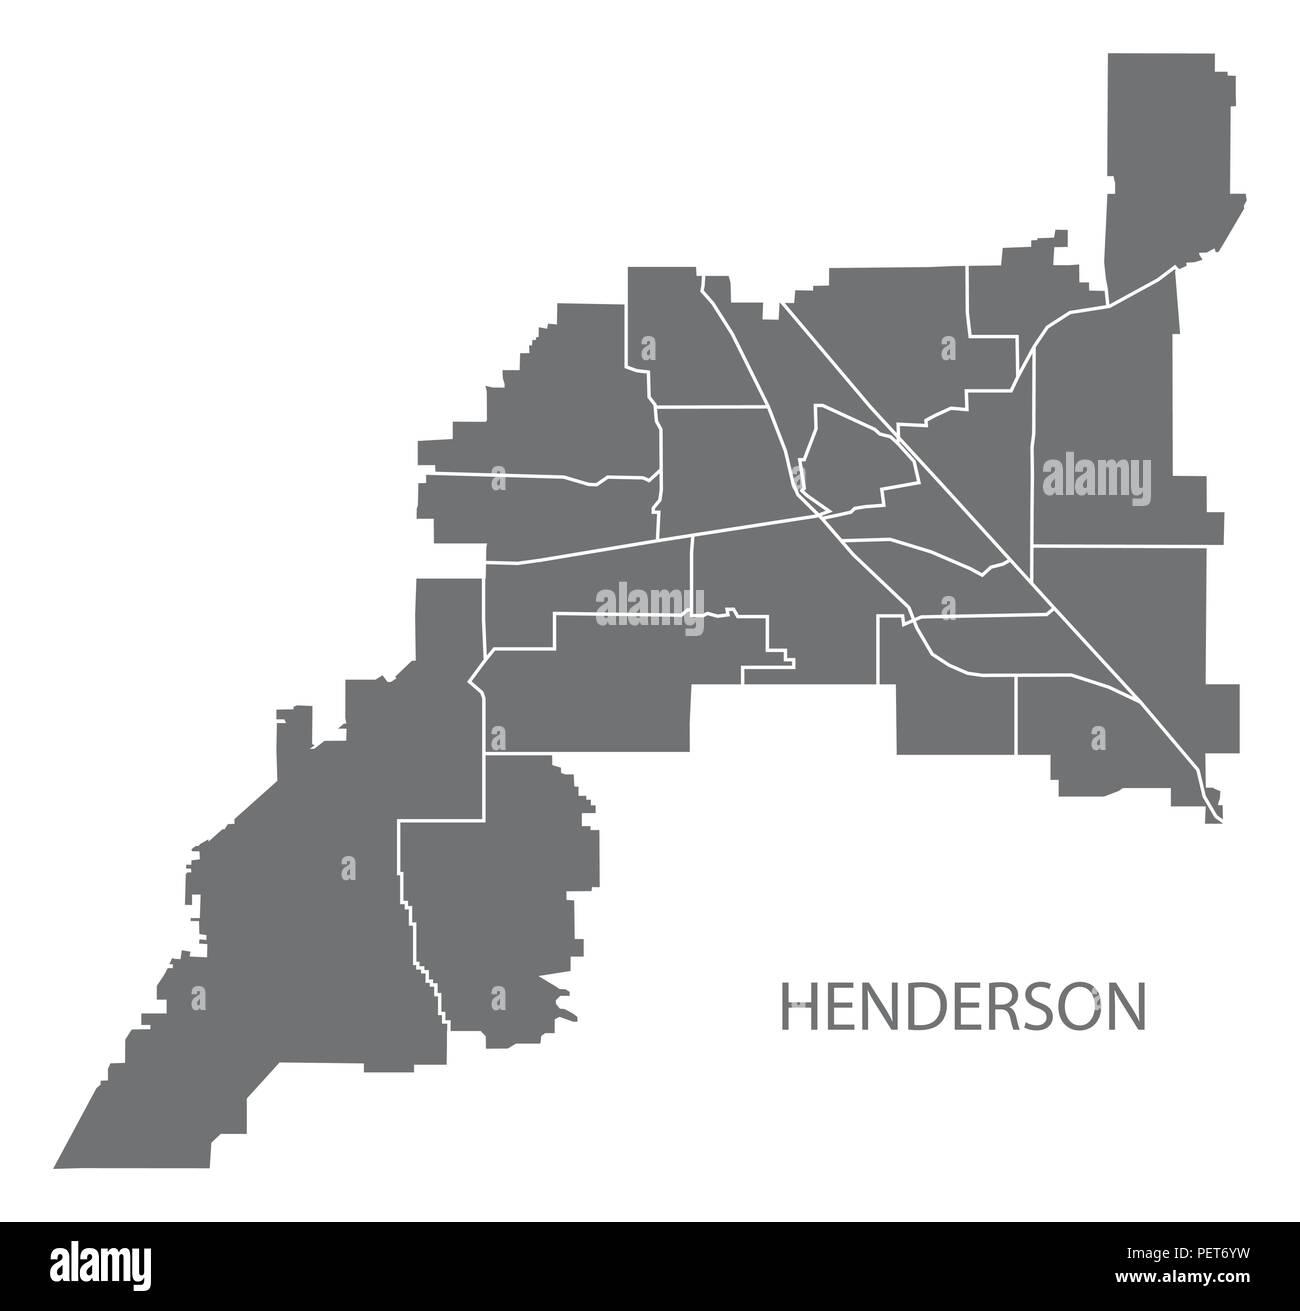 Henderson Nevada City Map With Neighborhoods Grey Illustration Silhouette Shape Stock Vector Image Art Alamy